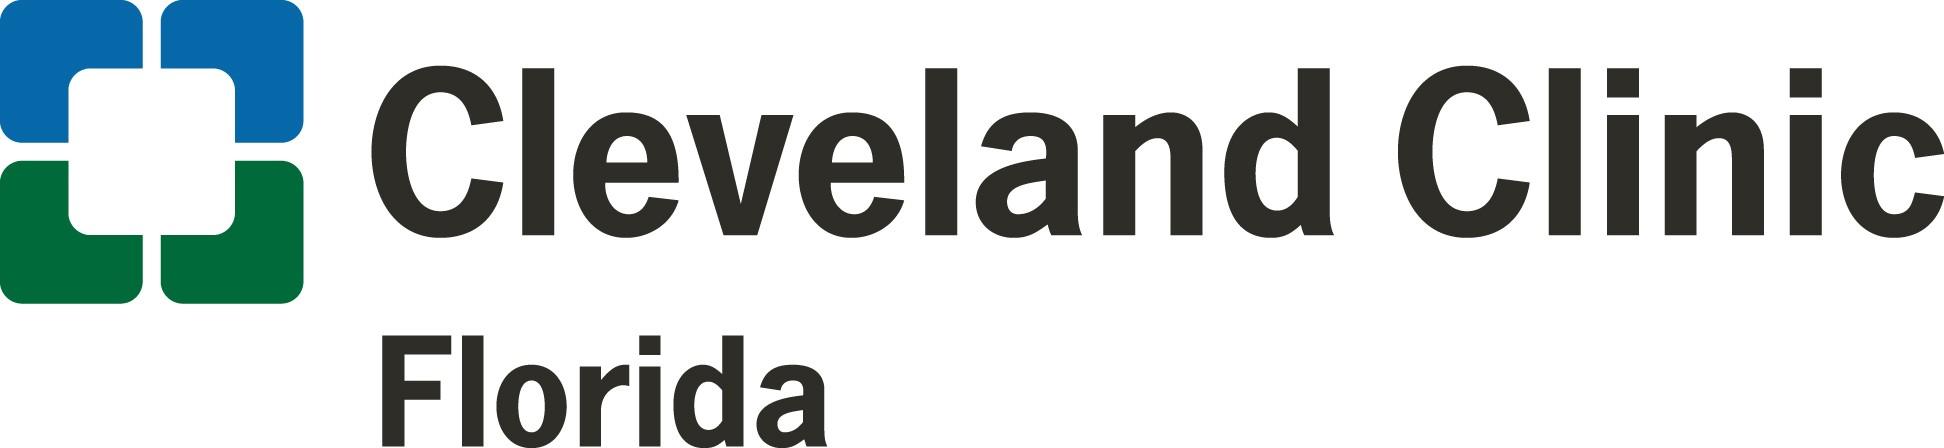 Cleveland Clinic - FL